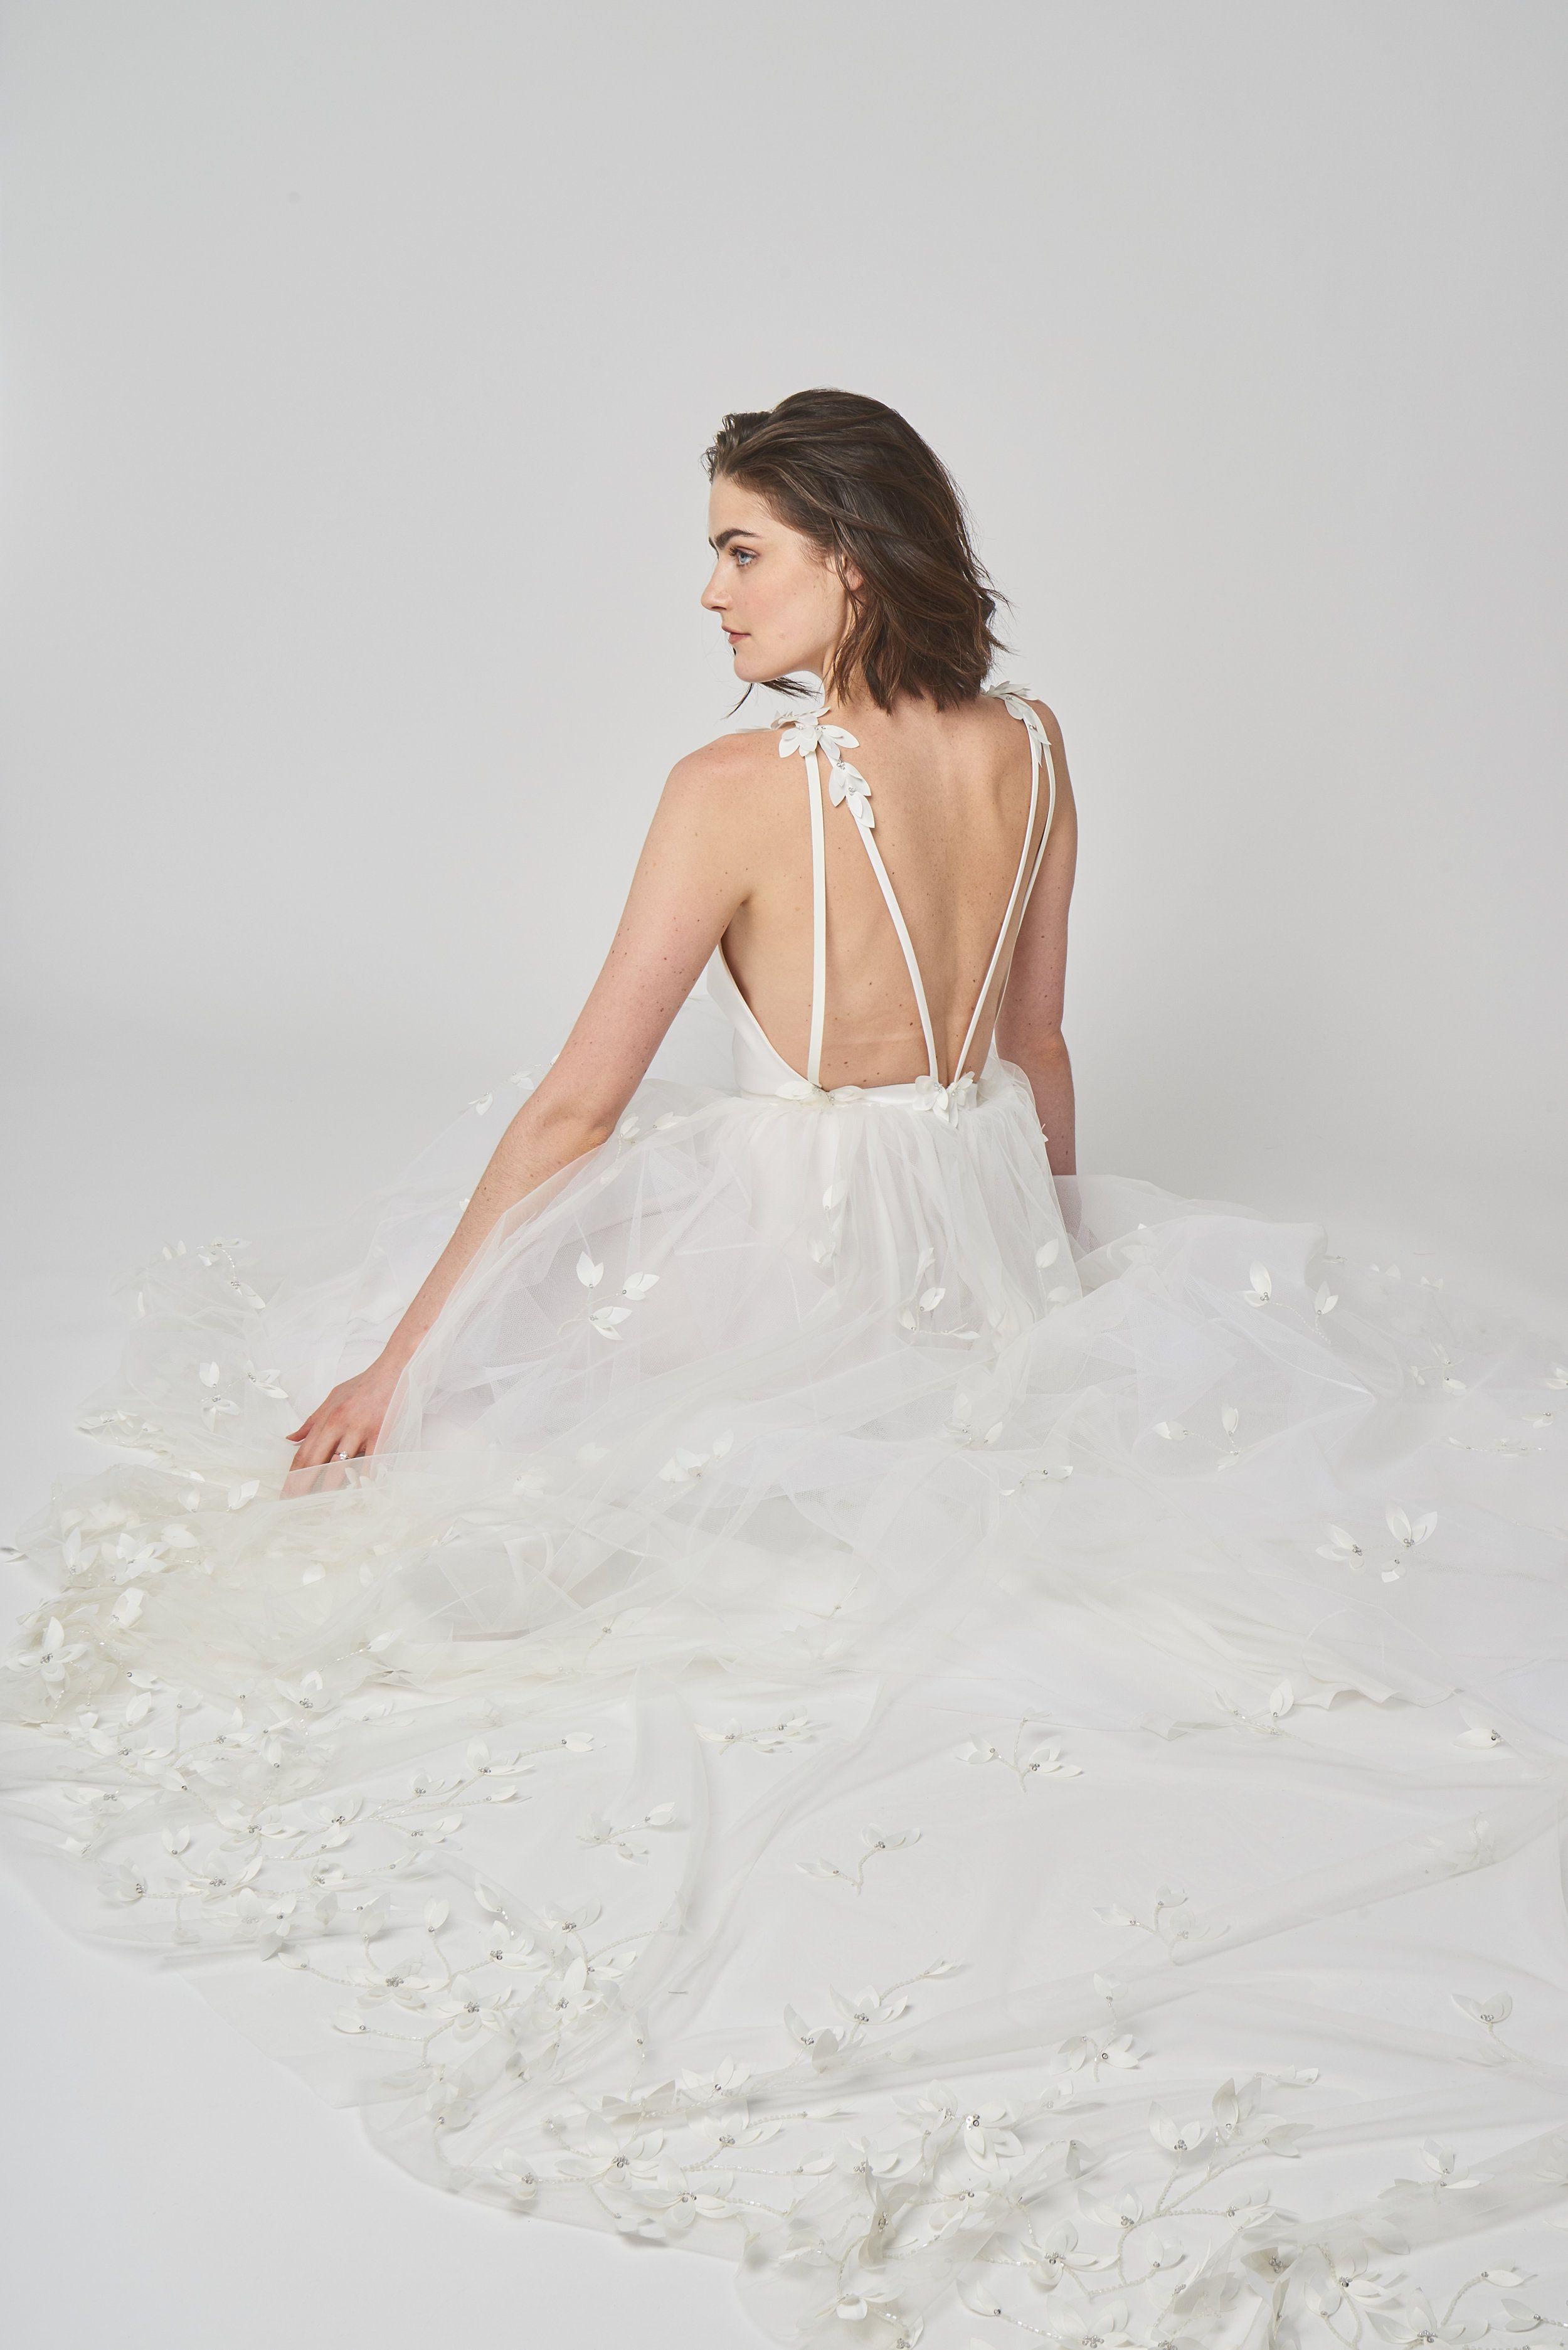 Pin by gina bloss on wedding dress inspiration pinterest gowns